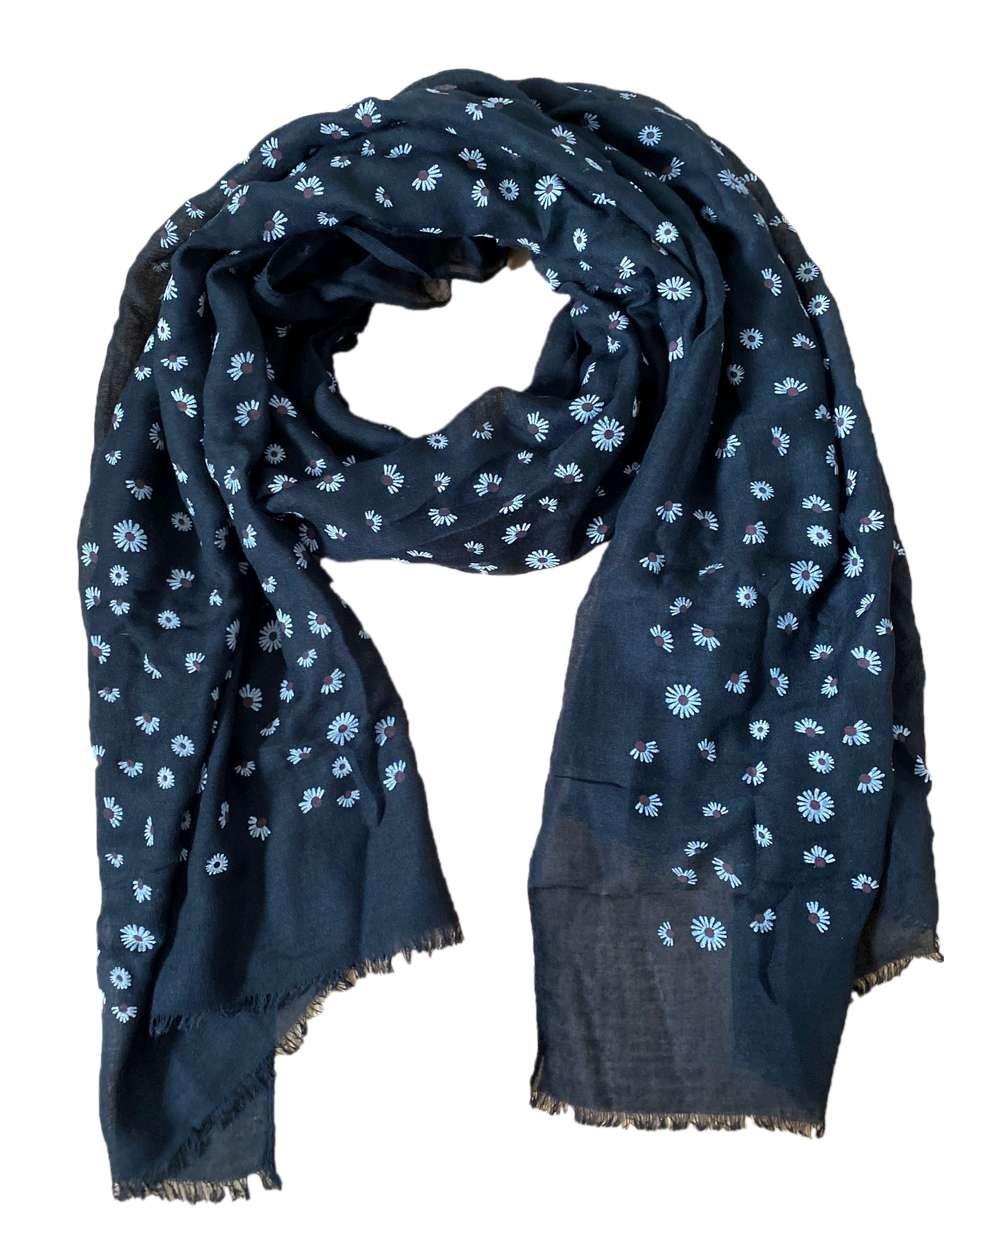 Foulard noir aux motifs fleurs